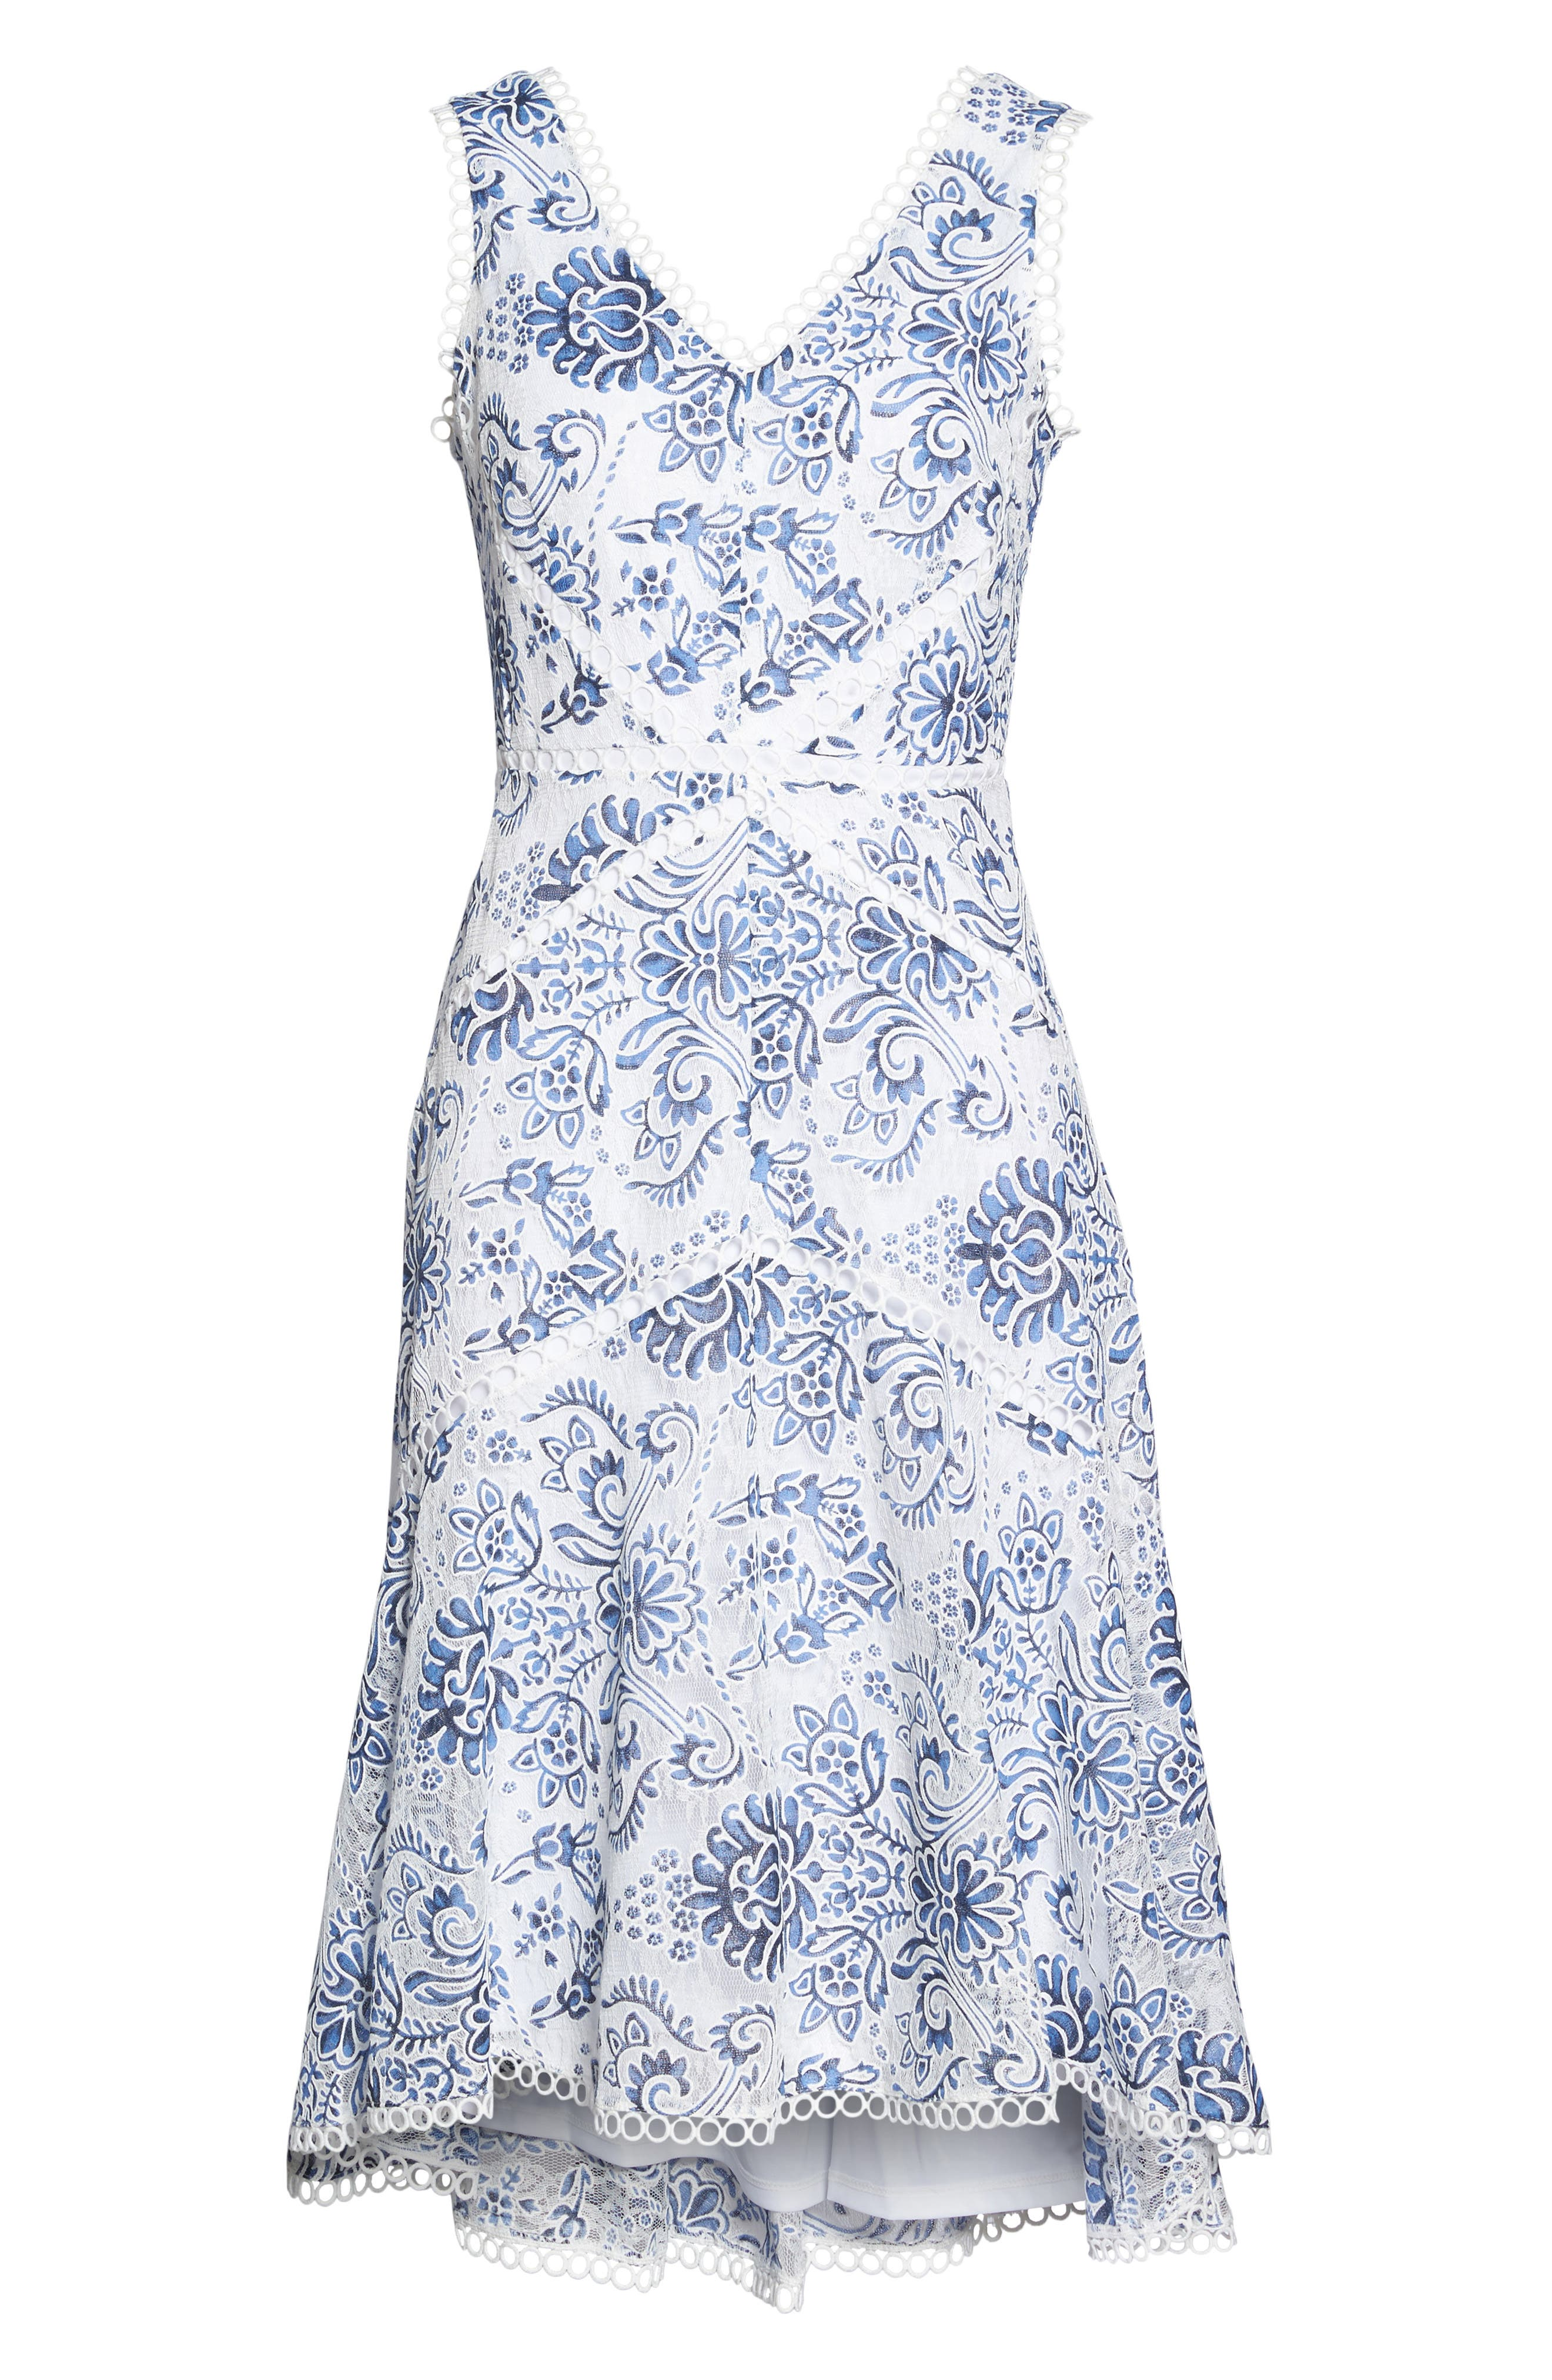 Burnout Lace Midi Dress,                             Alternate thumbnail 6, color,                             101